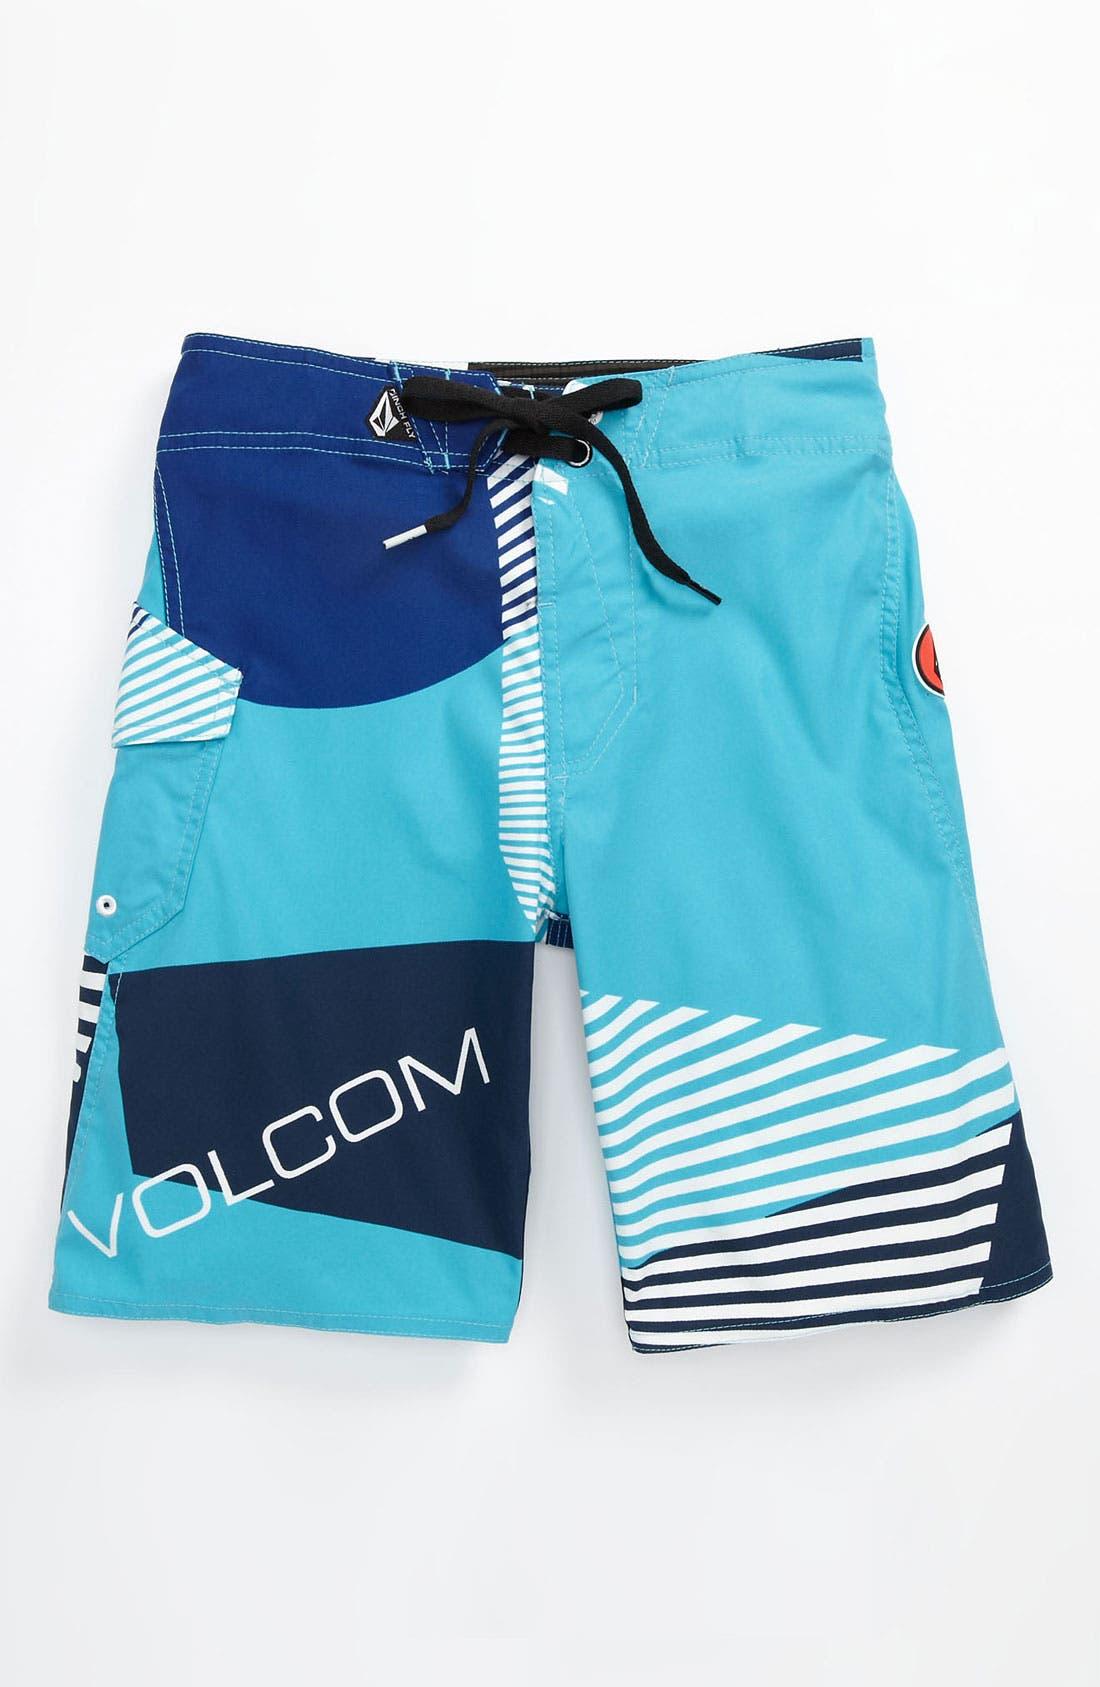 Main Image - Volcom 'Maguro Fun' Board Shorts (Big Boys)